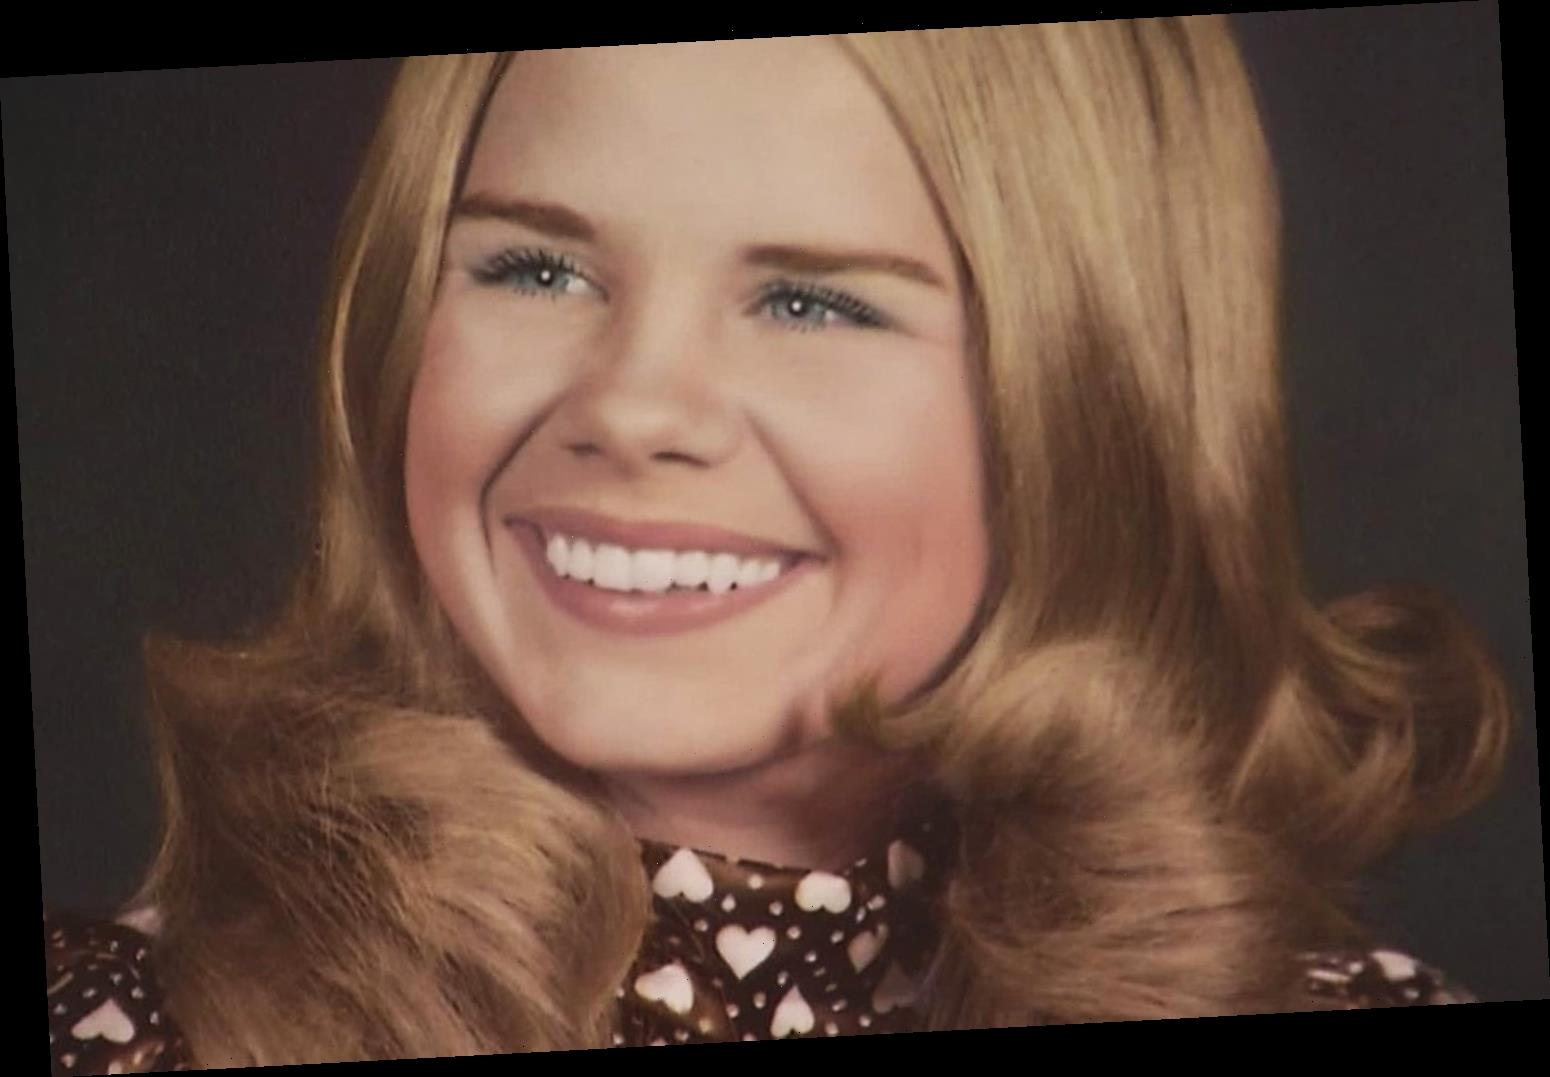 Man Arrested When DNA Allegedly Links Him to  Murder of Teen Girl After 1974 Valentine's Dance